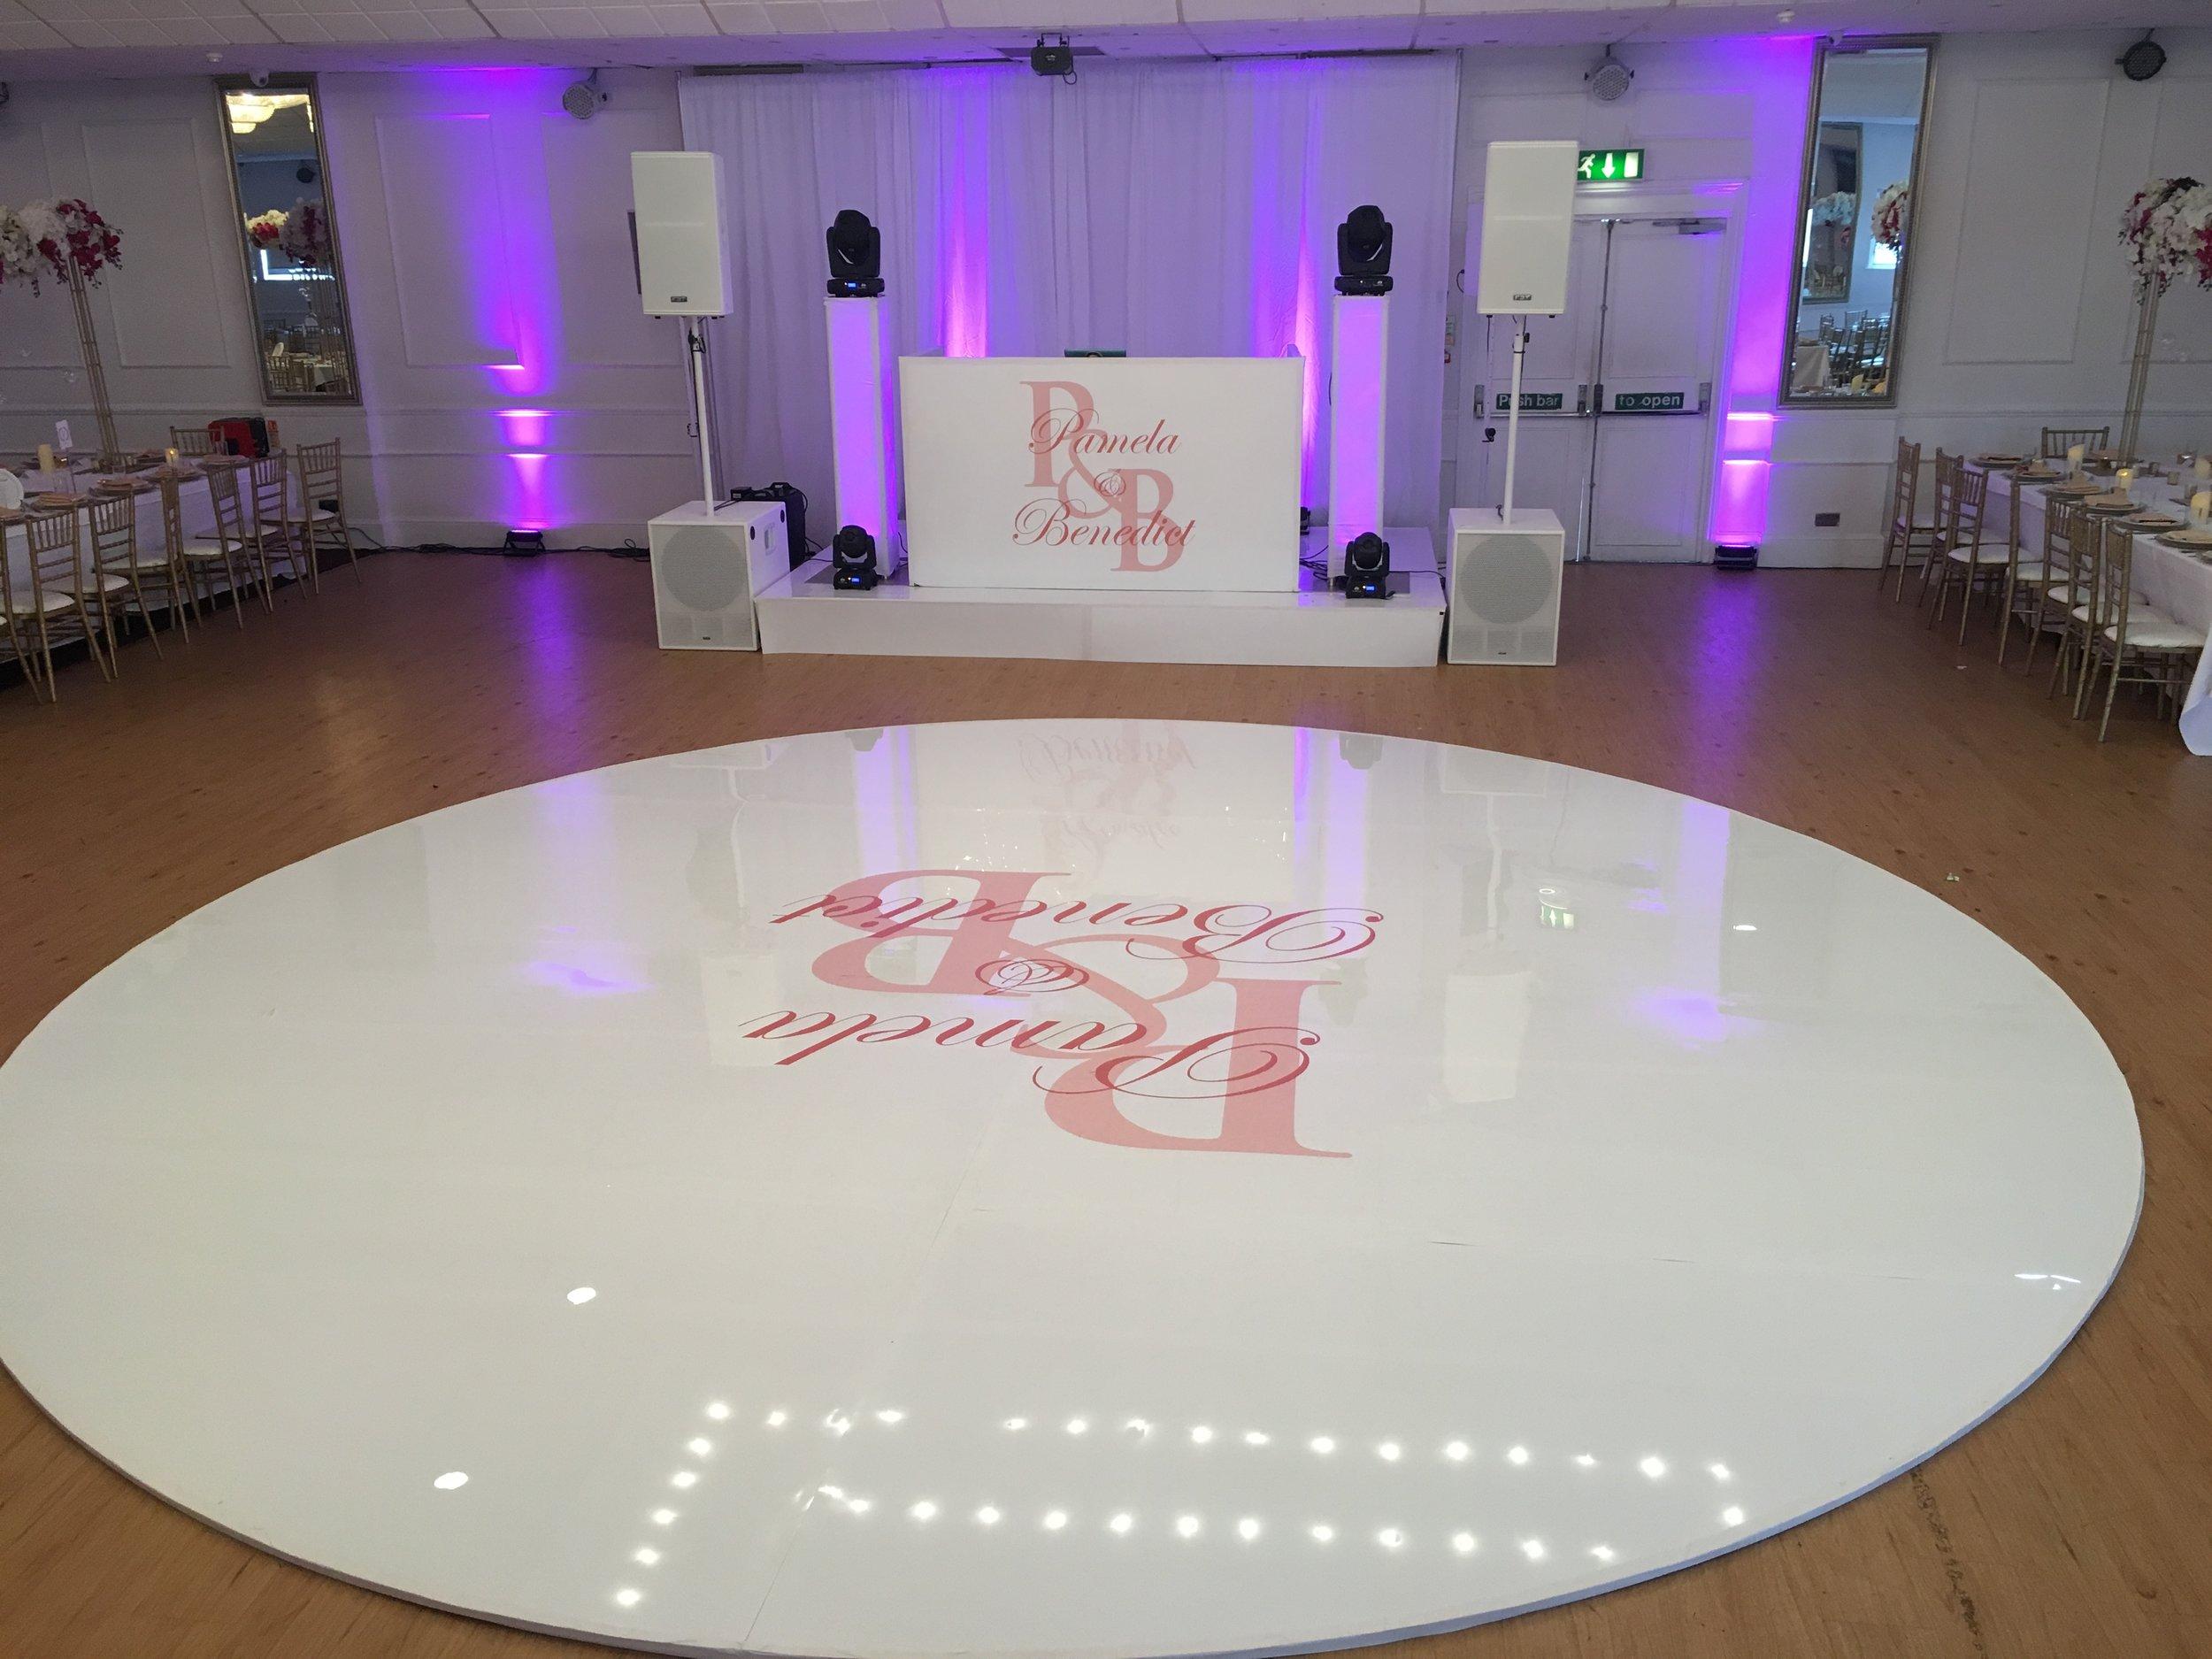 Round Seamless Dancefloor.JPG